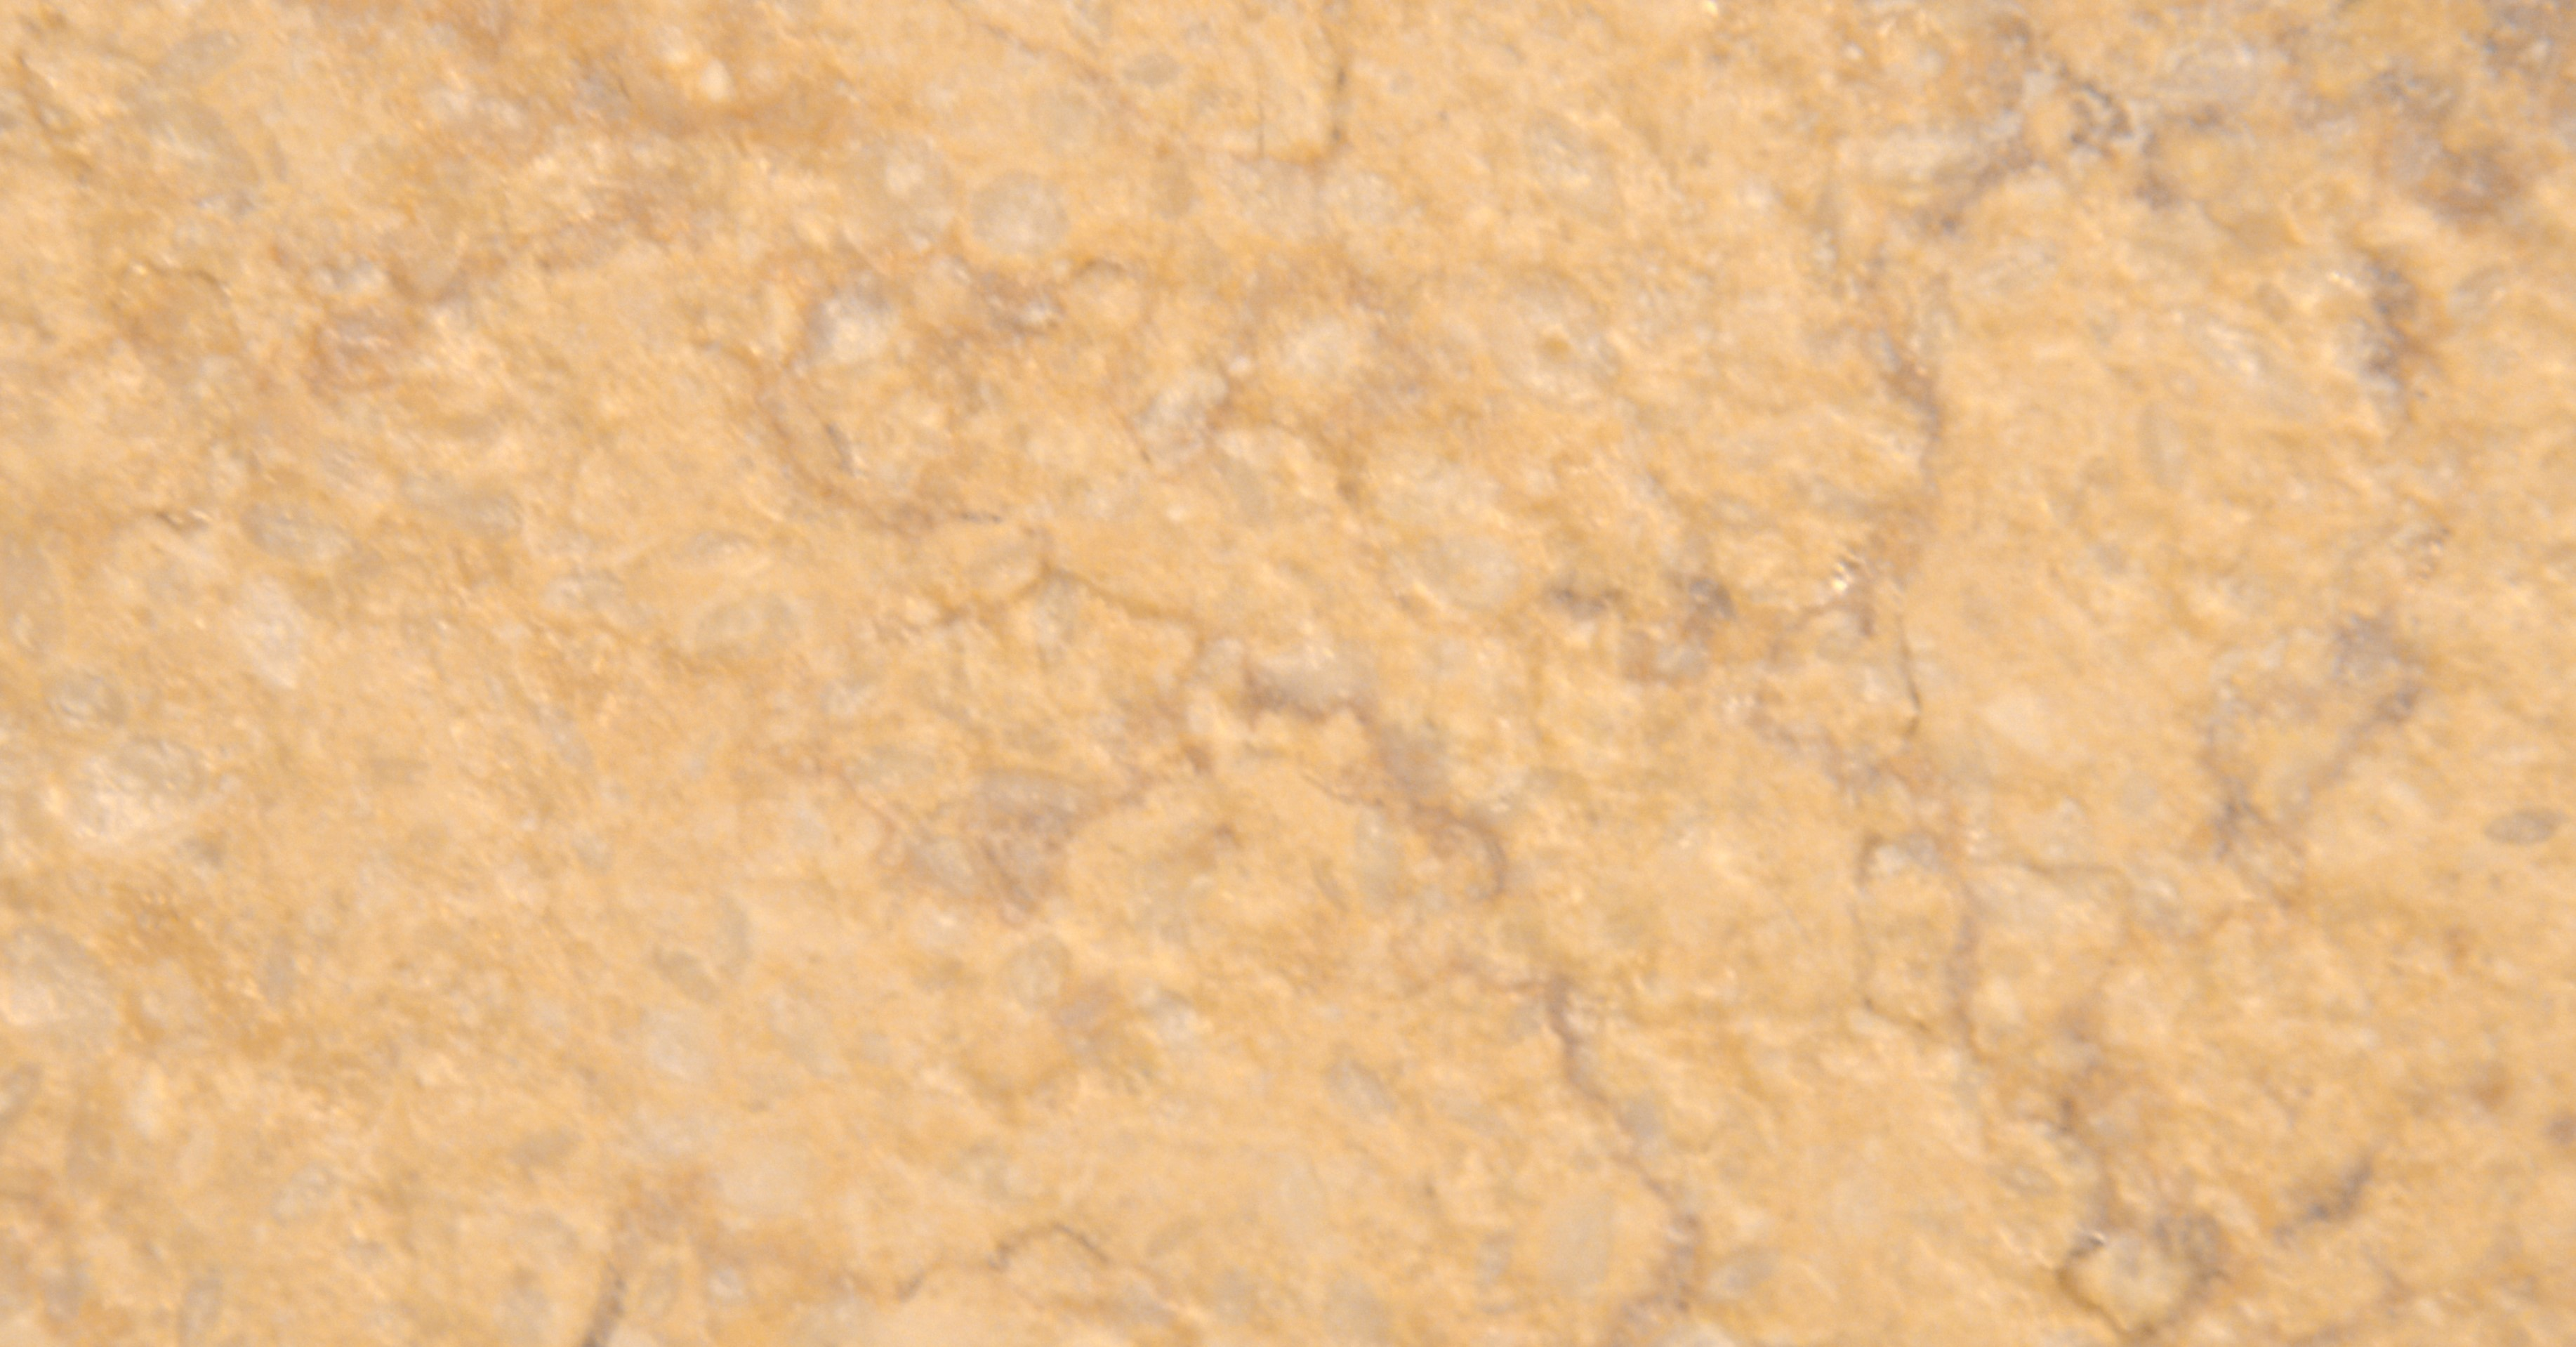 Мрамор Голден Фэнтази (Golden Fantasy Marble) antique